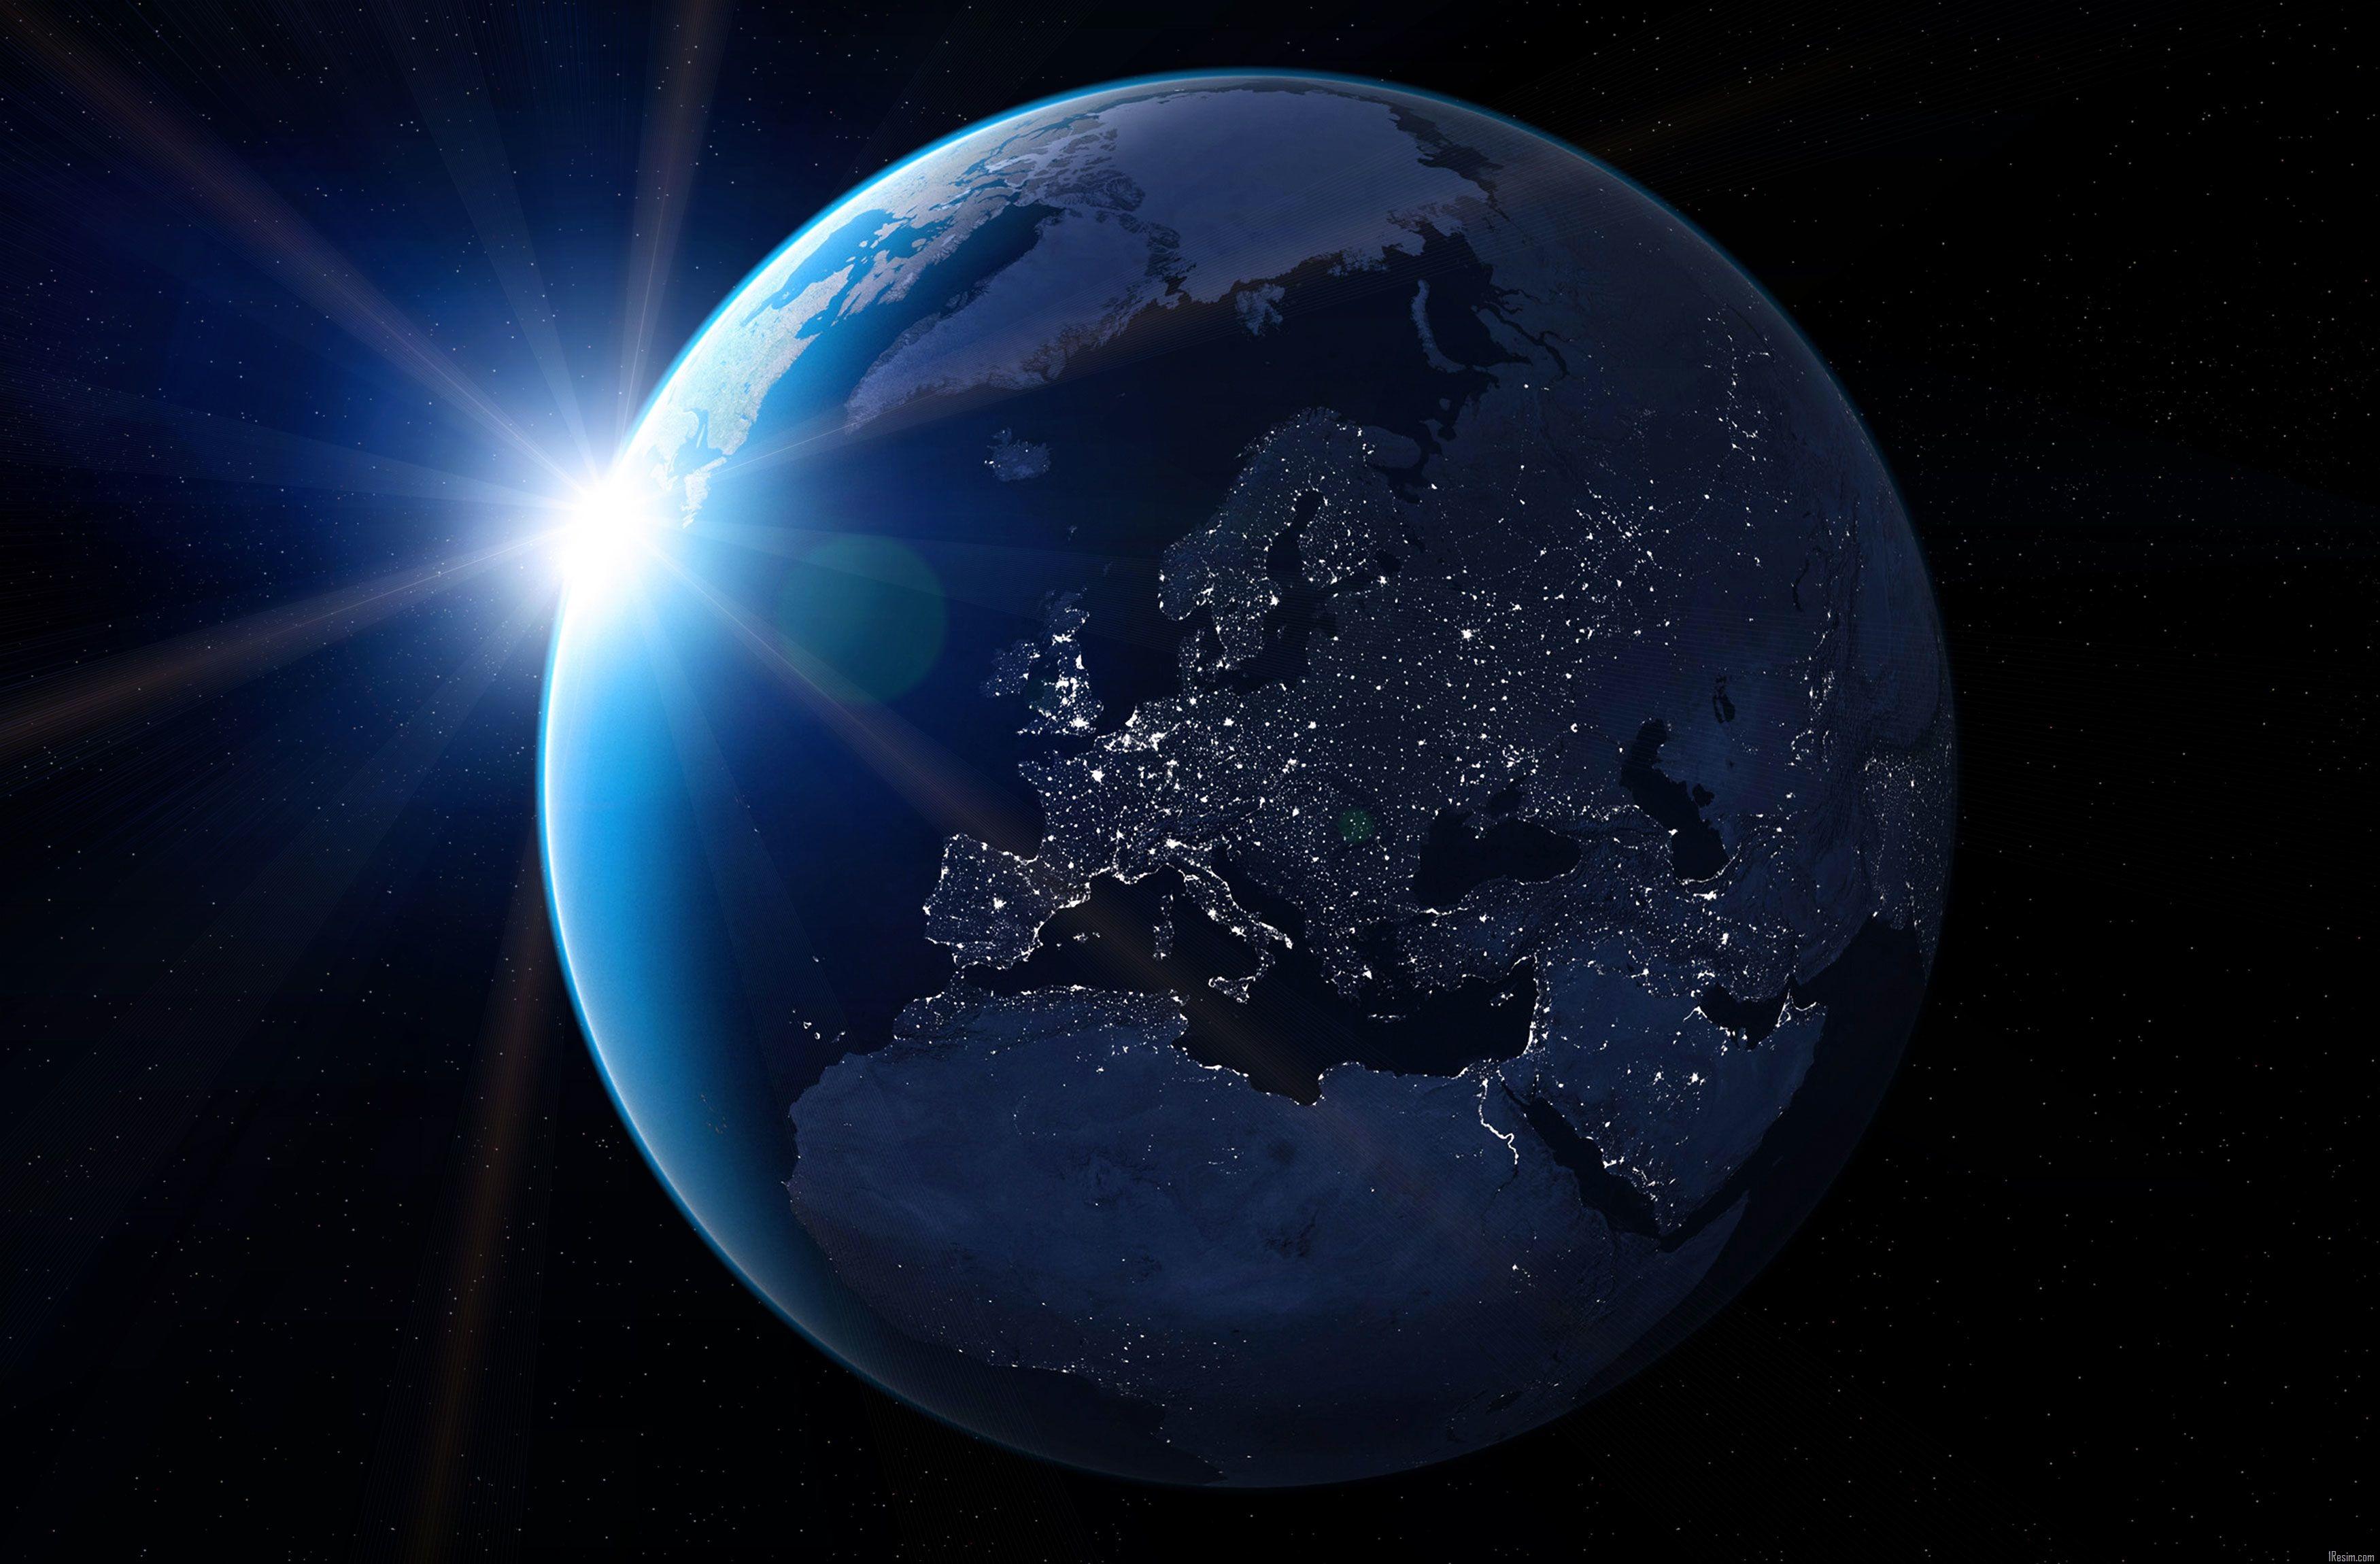 Uzay çöplüğü Dünya'ya düşecek